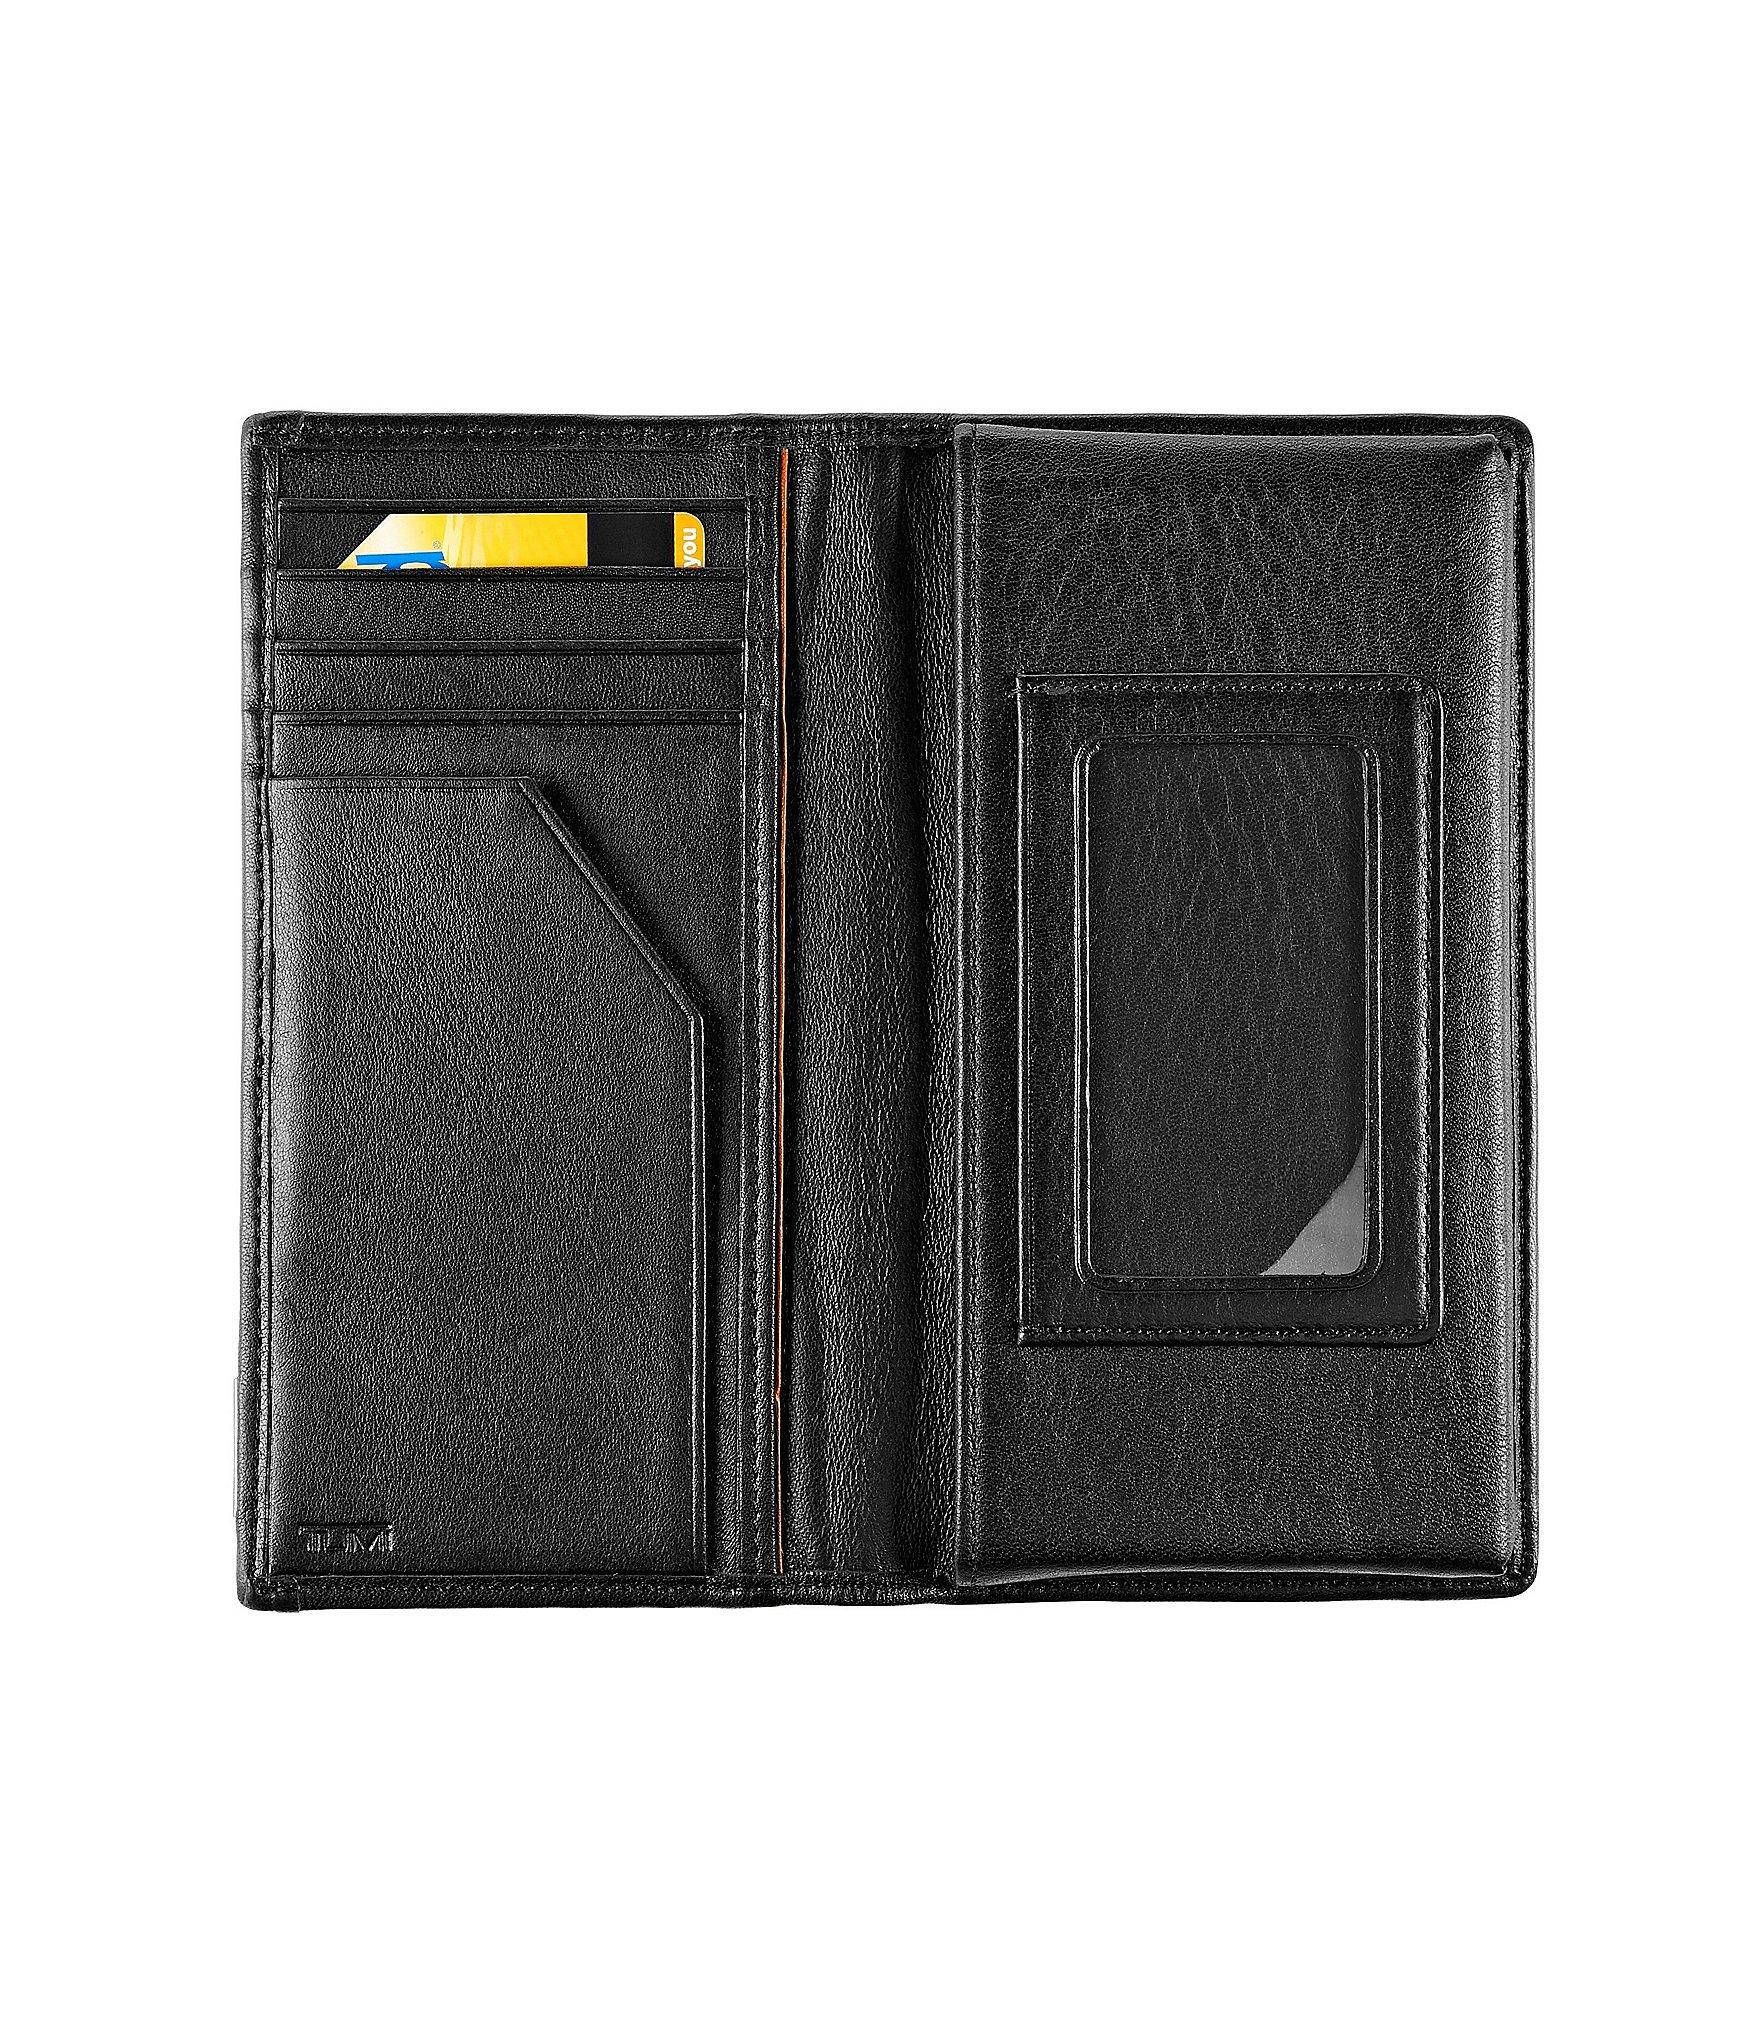 Tumi Mens Fxt Ballistic Nylon Wallets 9